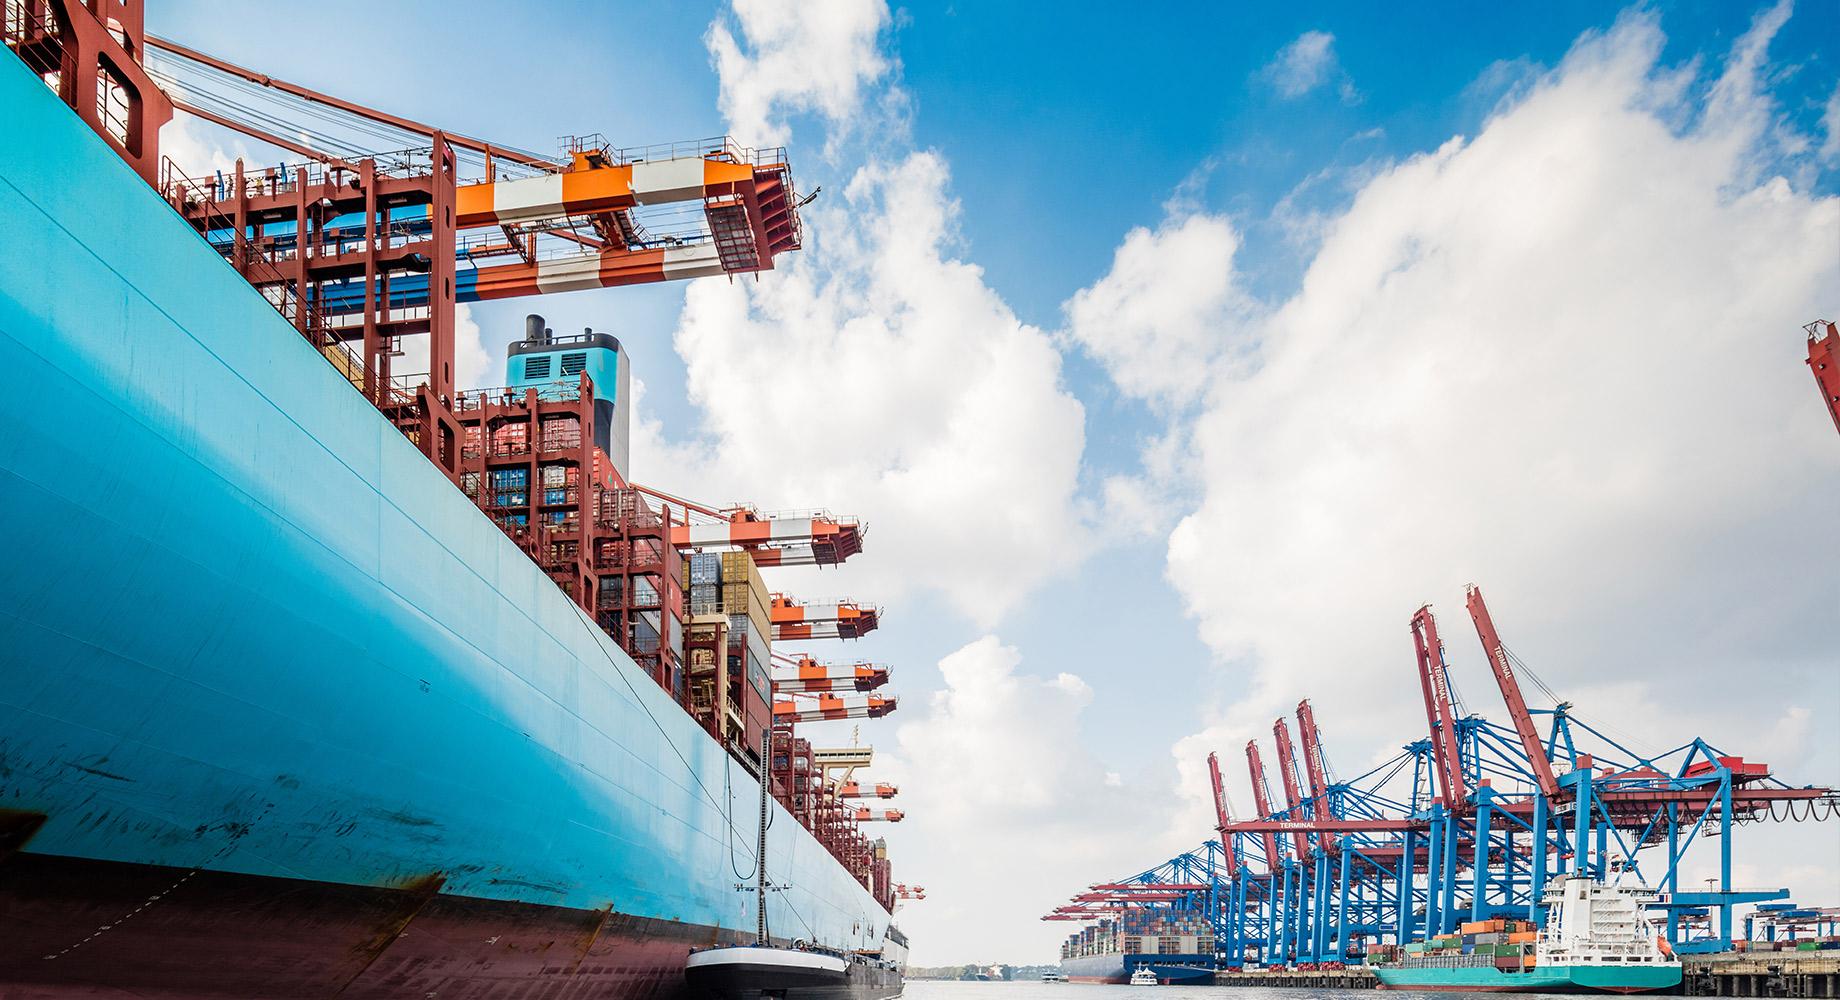 A shipyard awaiting freight